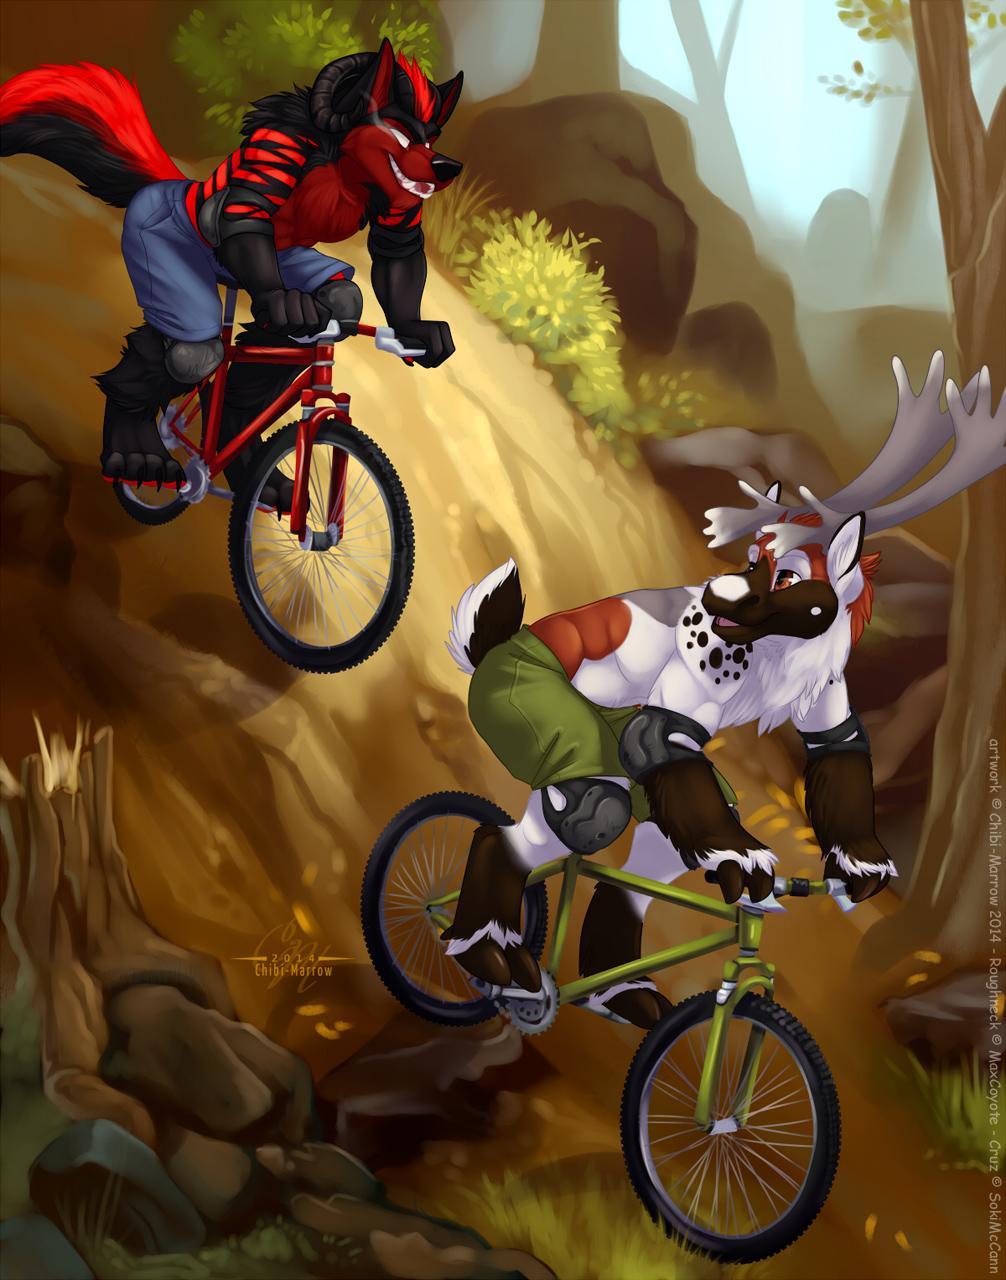 [COM] Downhill Demon (by Chibi-Marrow)